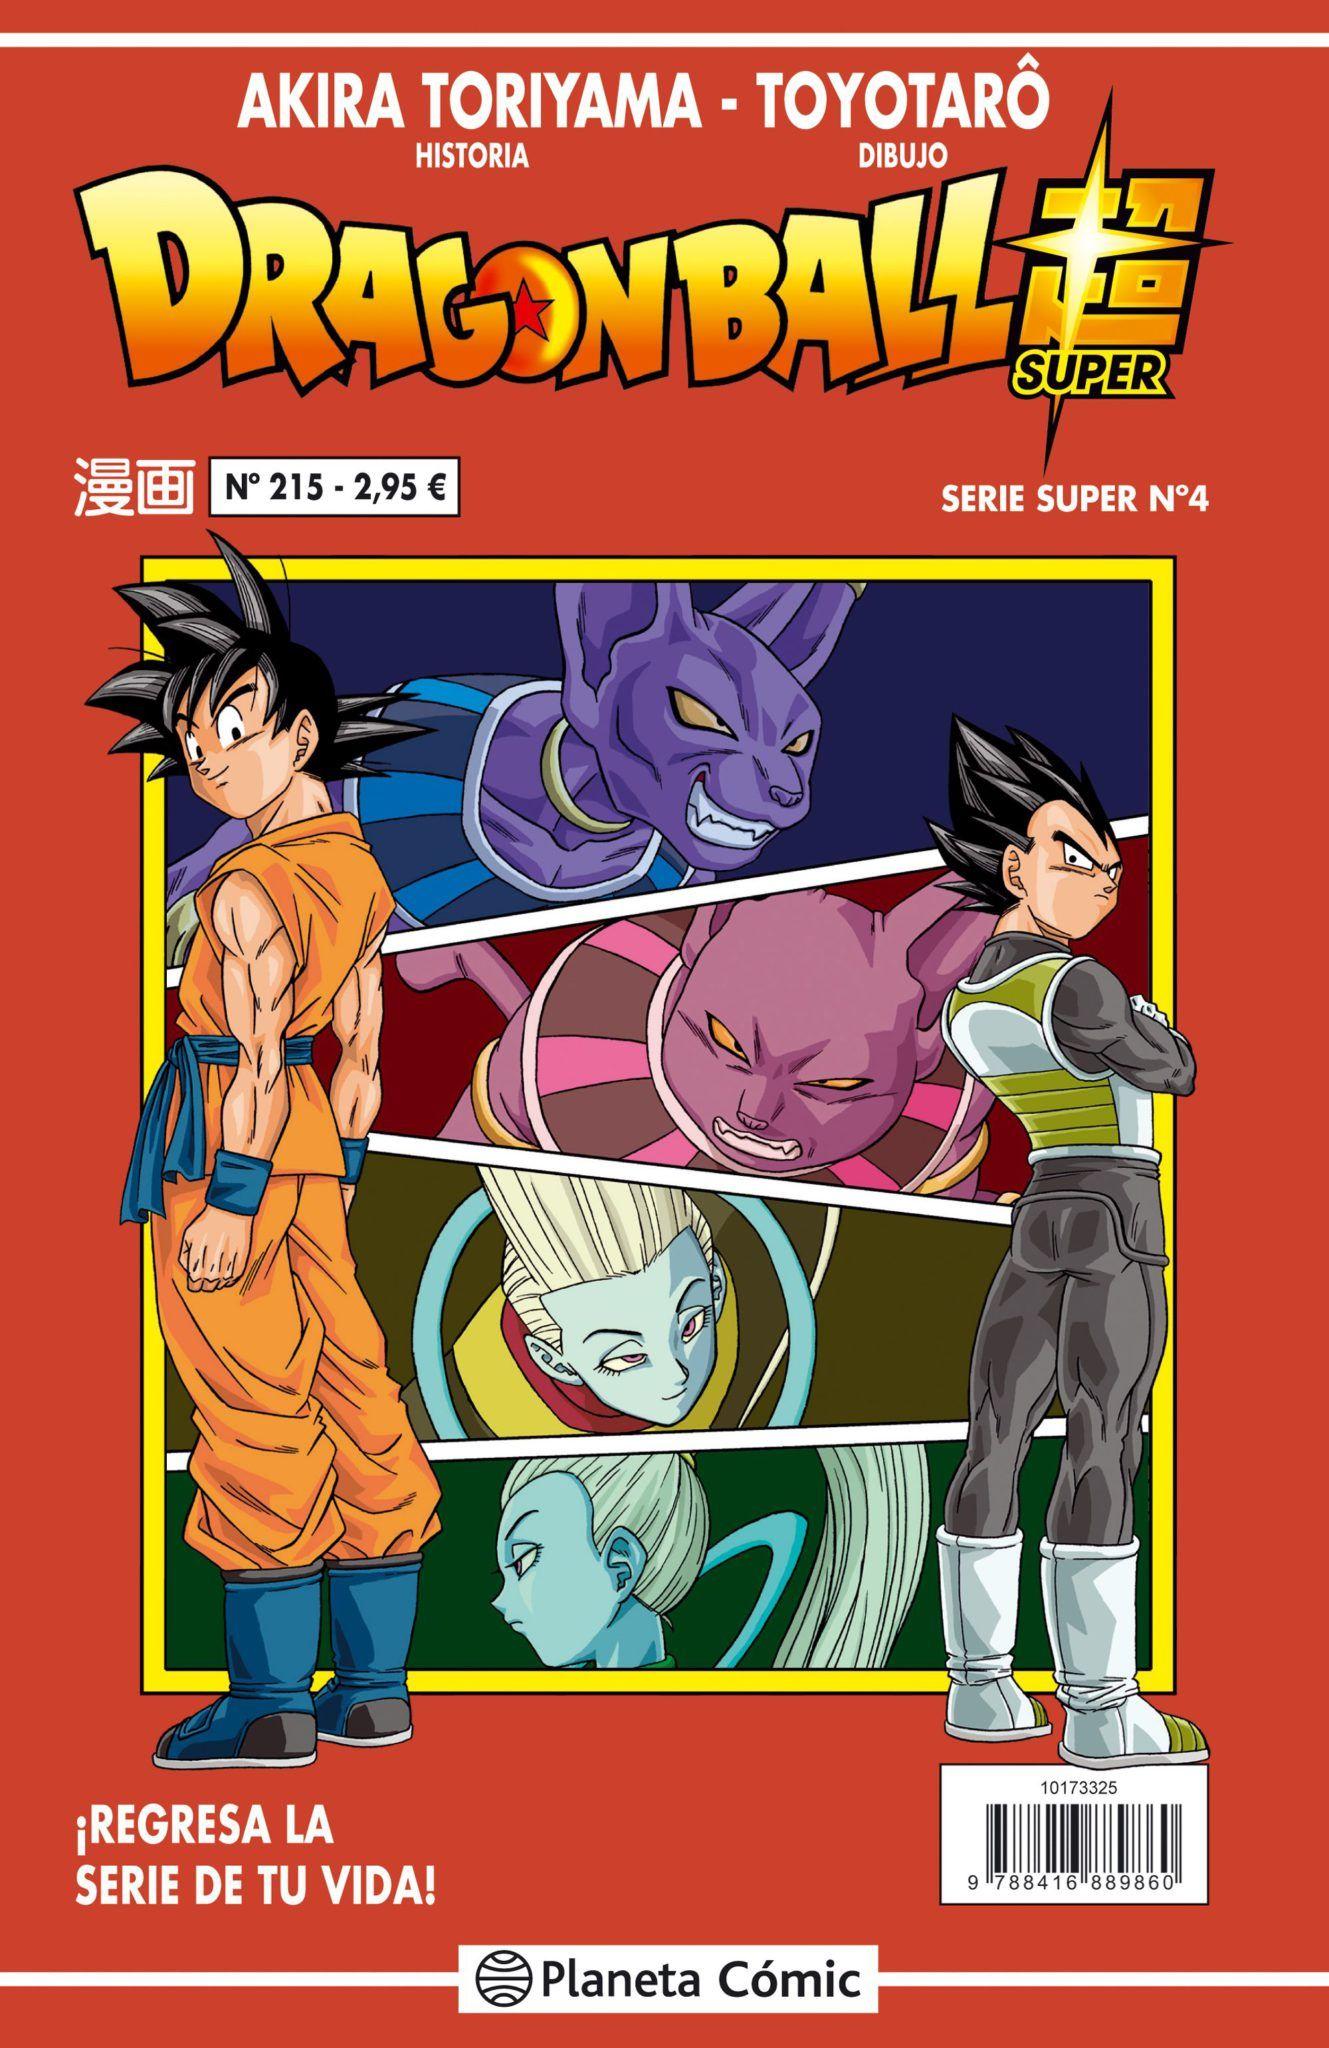 portada_dragon-ball-serie-roja-n-215216_akira-toriyama_201704241104